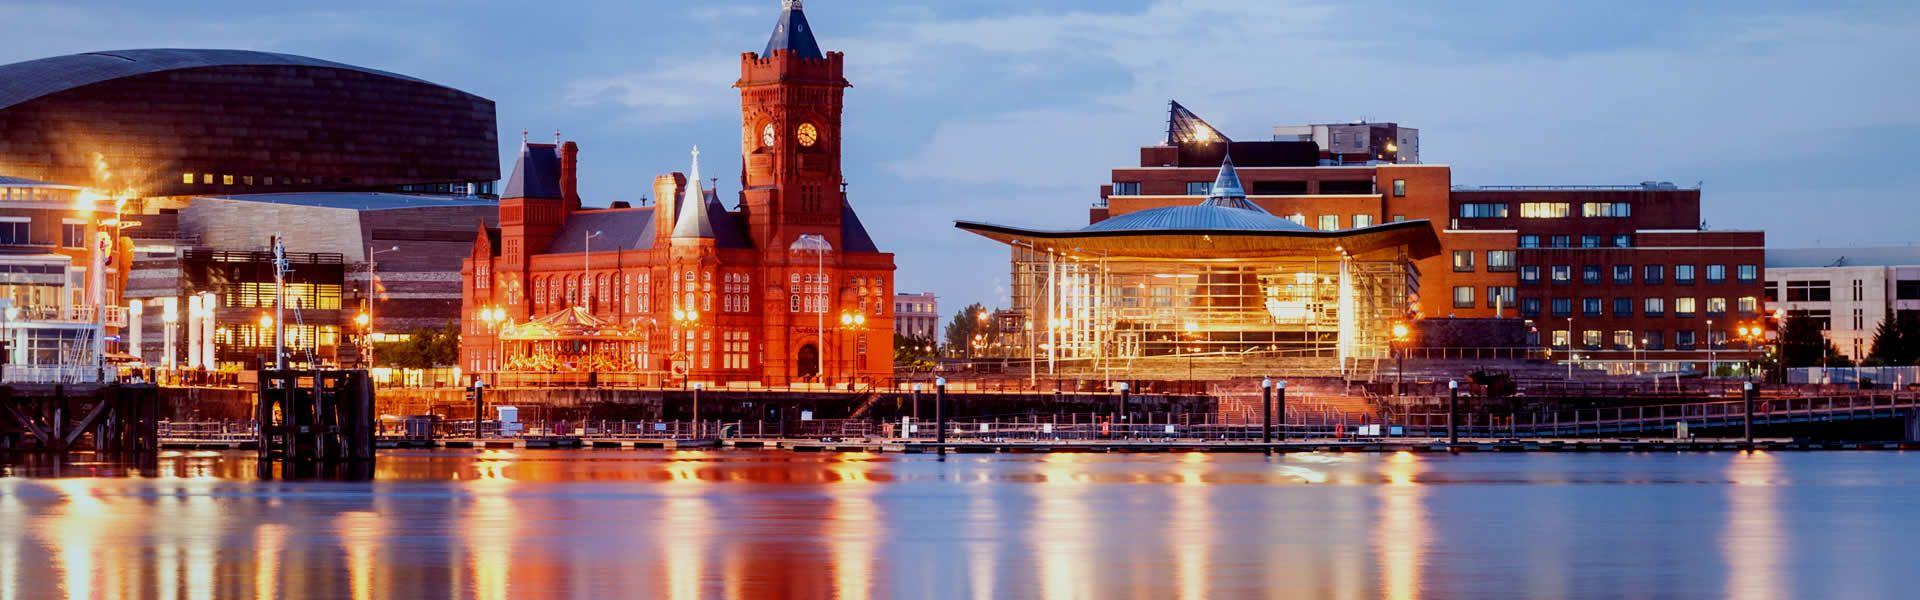 Cardiff Bay Boat Trips Cardiff Cruises Cardiff Bay Cardiff Cardiff Wales